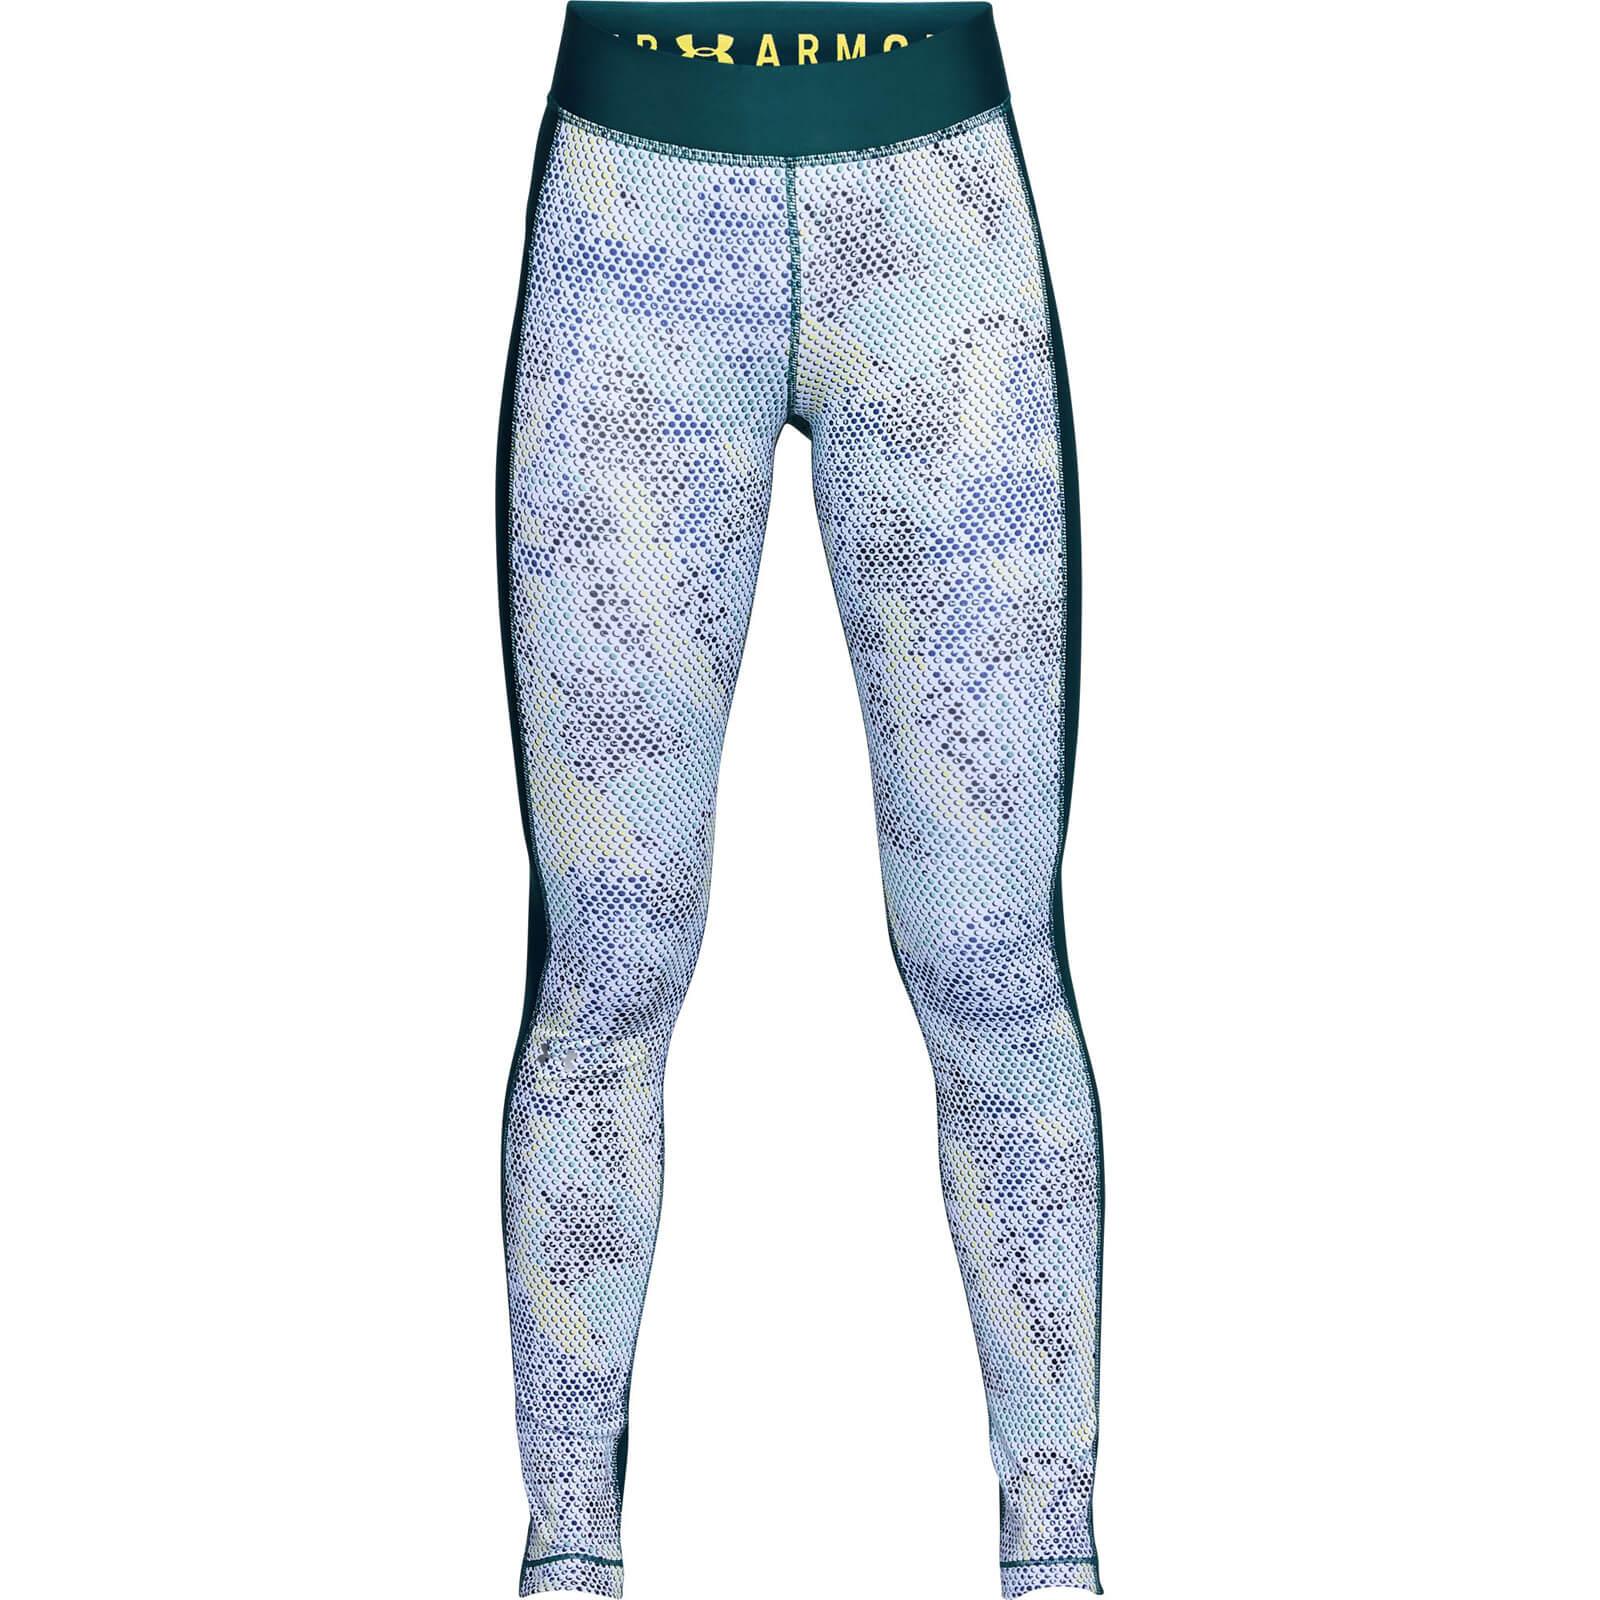 e727756fc05f2 Under Armour Women s HeatGear Armour Printed Leggings - Green Sports    Leisure